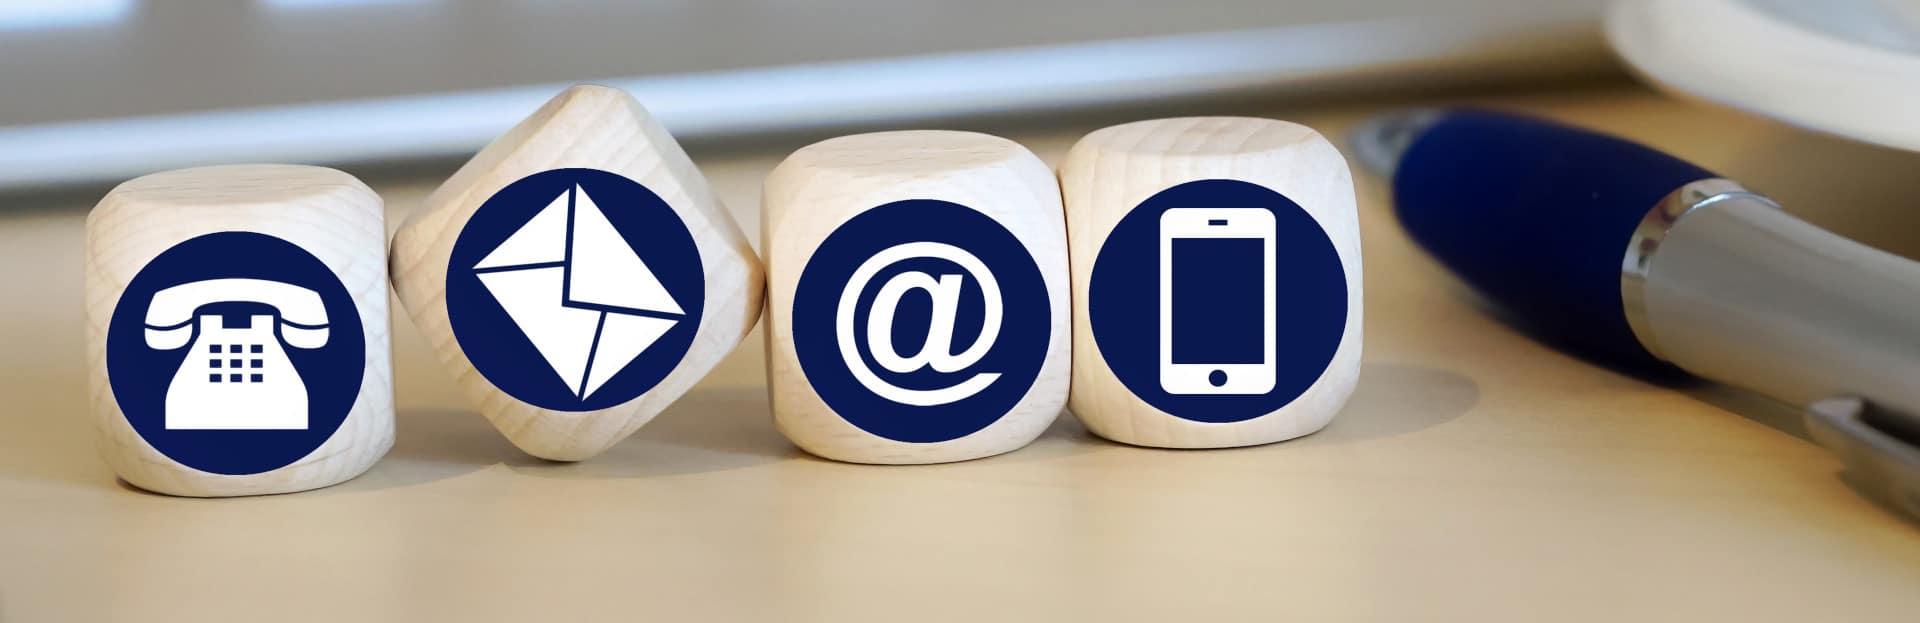 Prototec Social Media